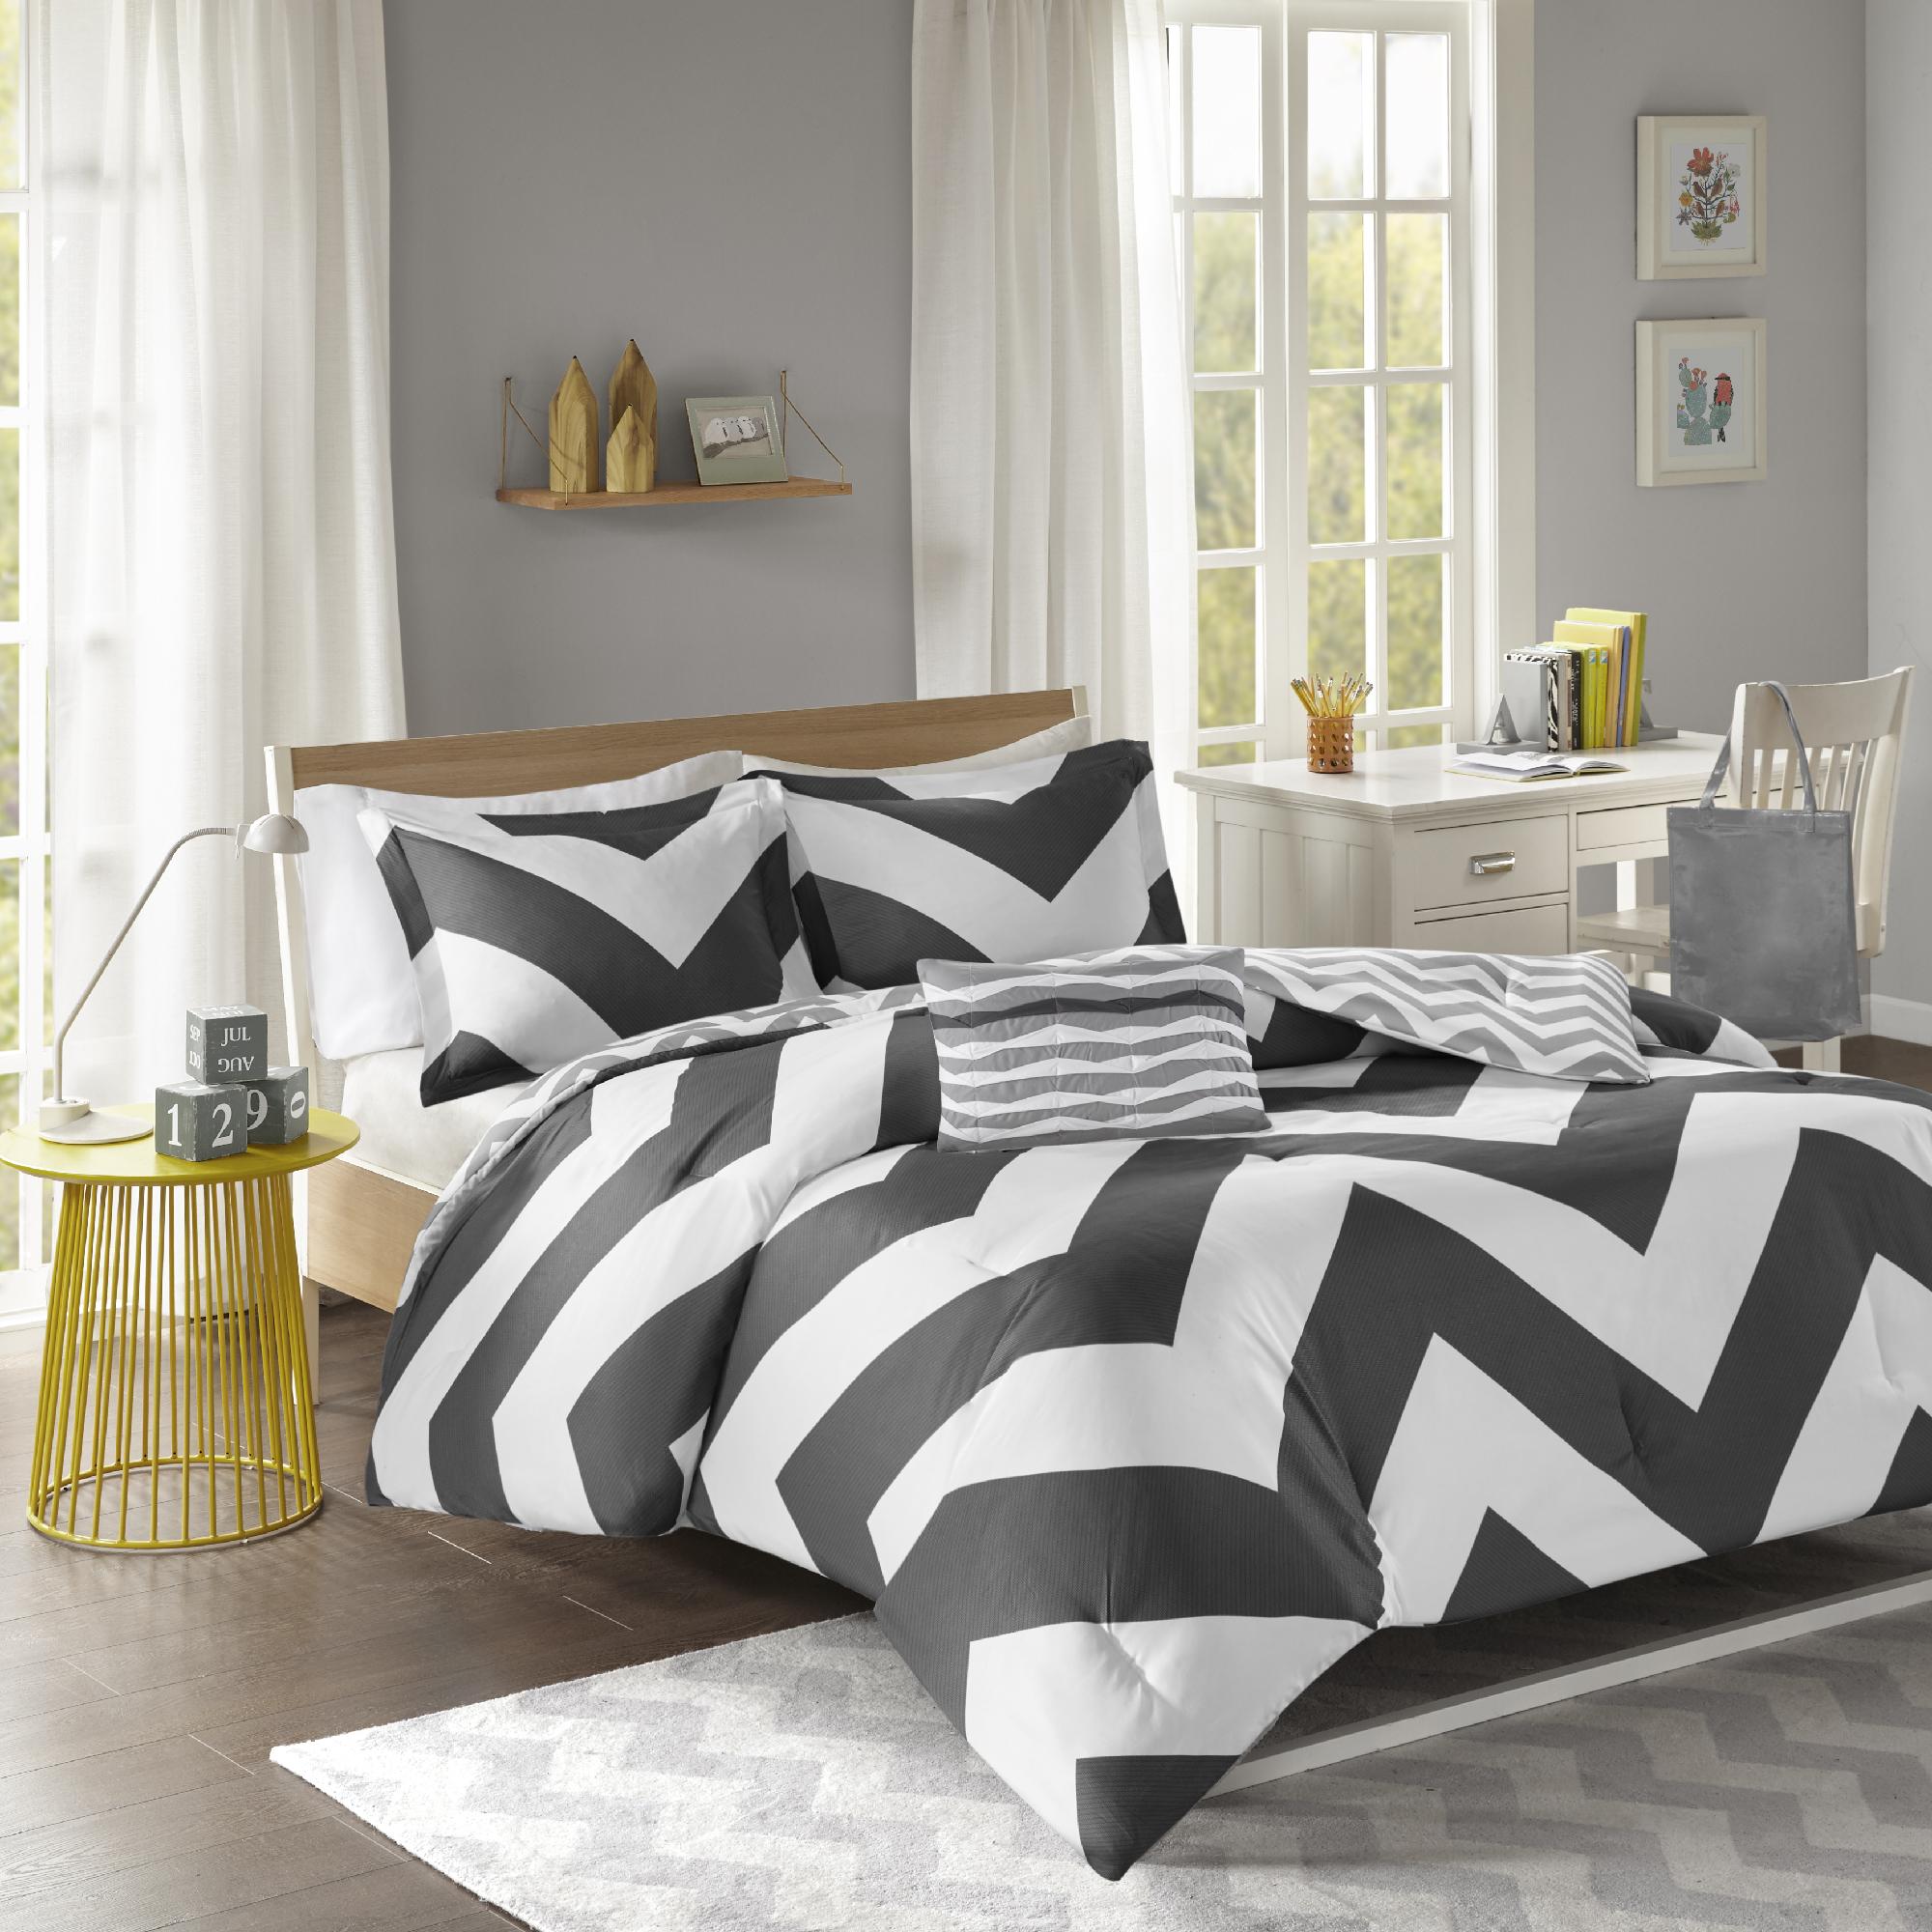 Home Essence Teen Leo Ultra Soft Reversible Bedding Comforter Set